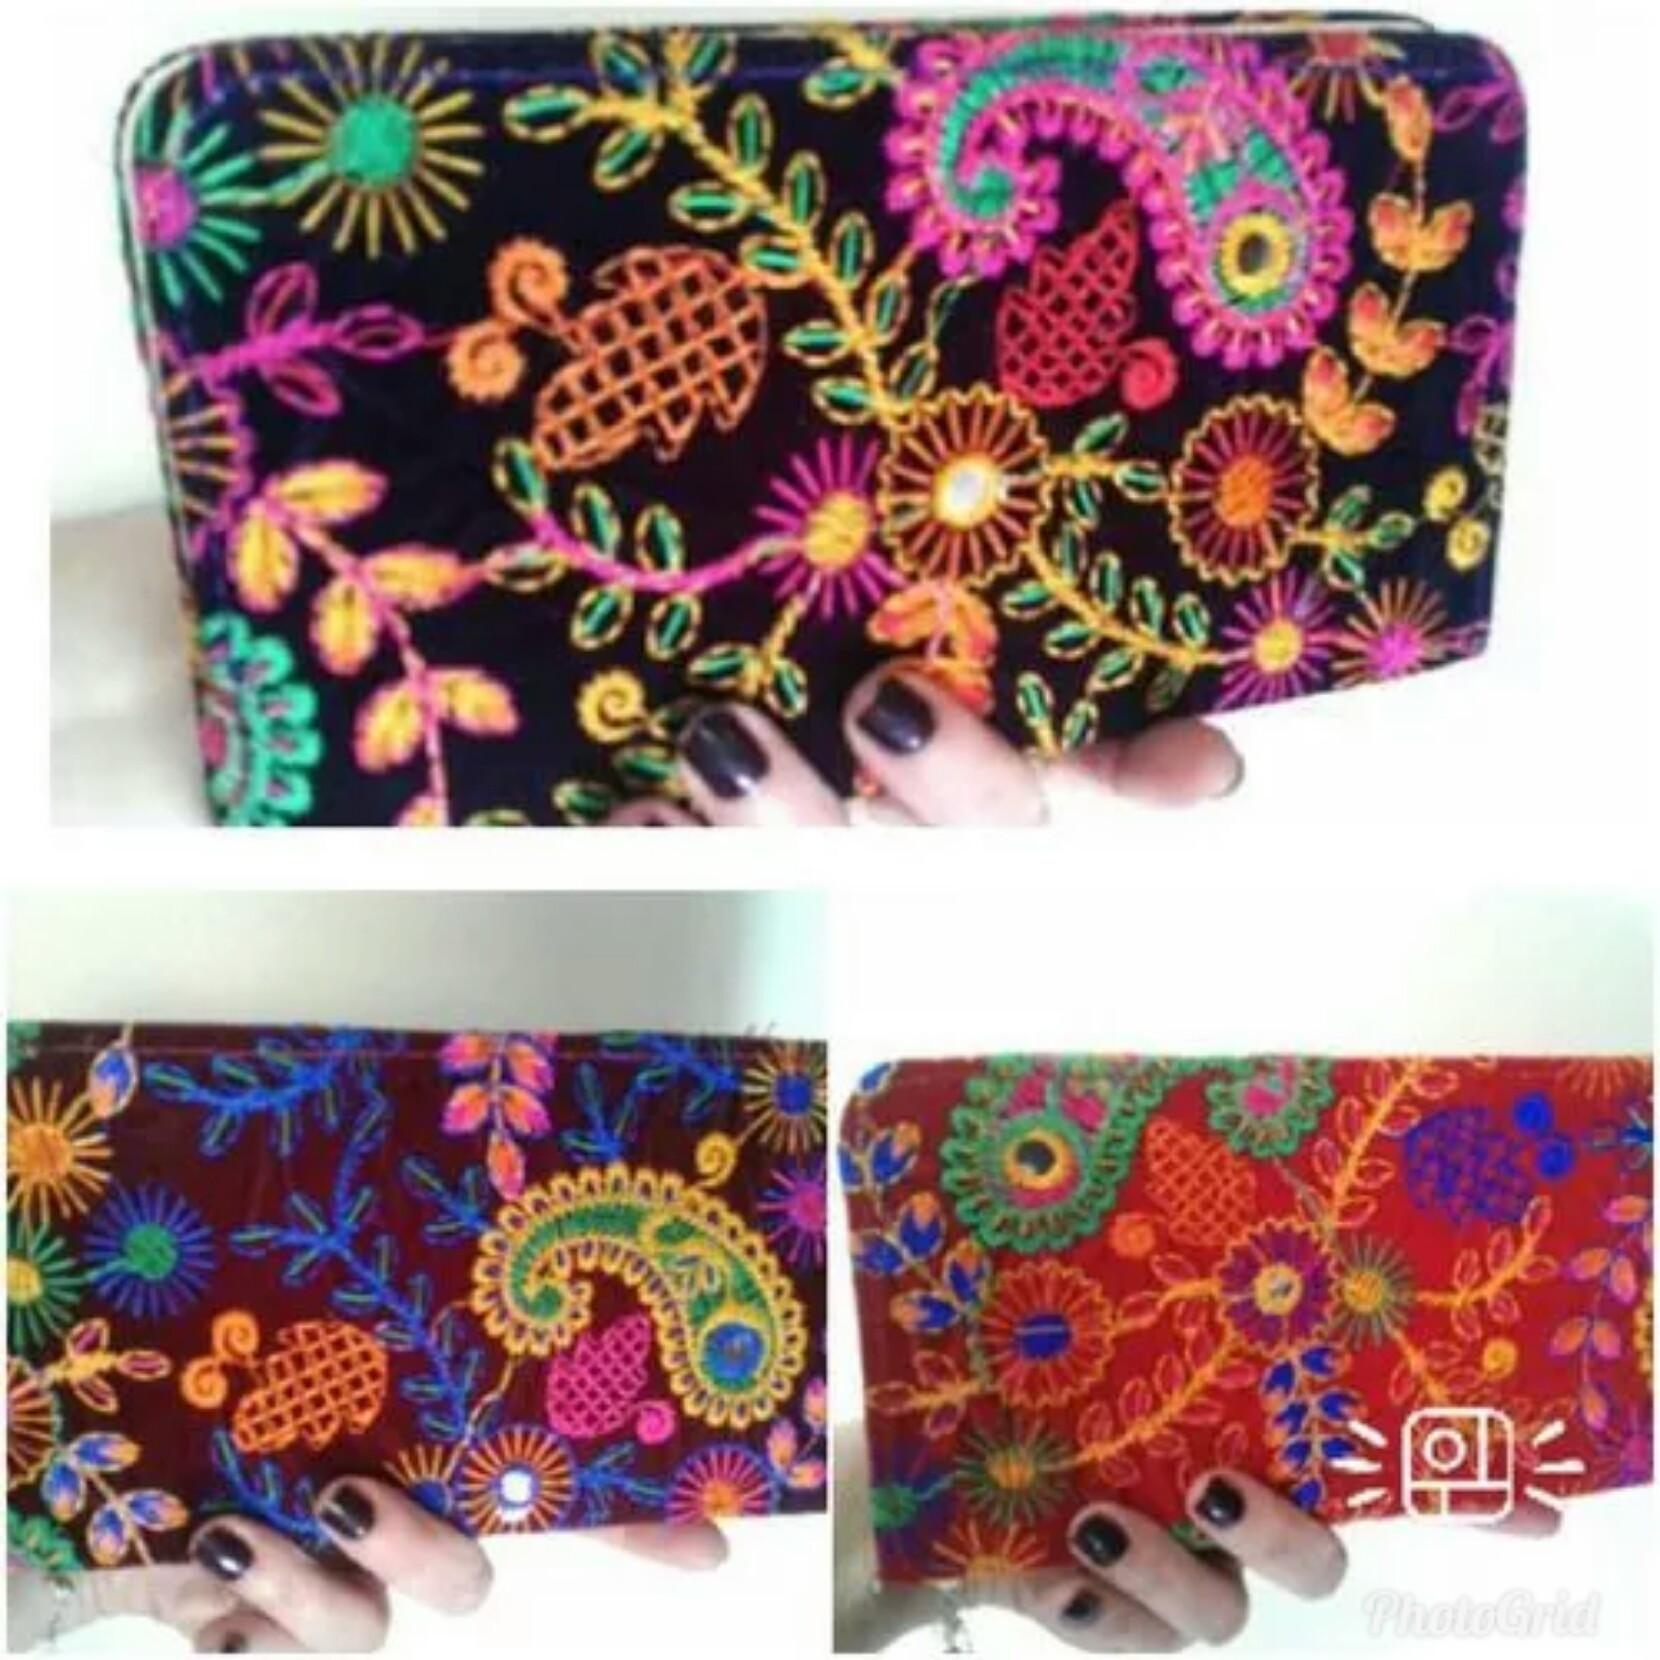 e4f5dfac5 carteira clutch Estilo Indiano bordadas a mão no Elo7 | Lakshimi moda  indiana (D258BA)